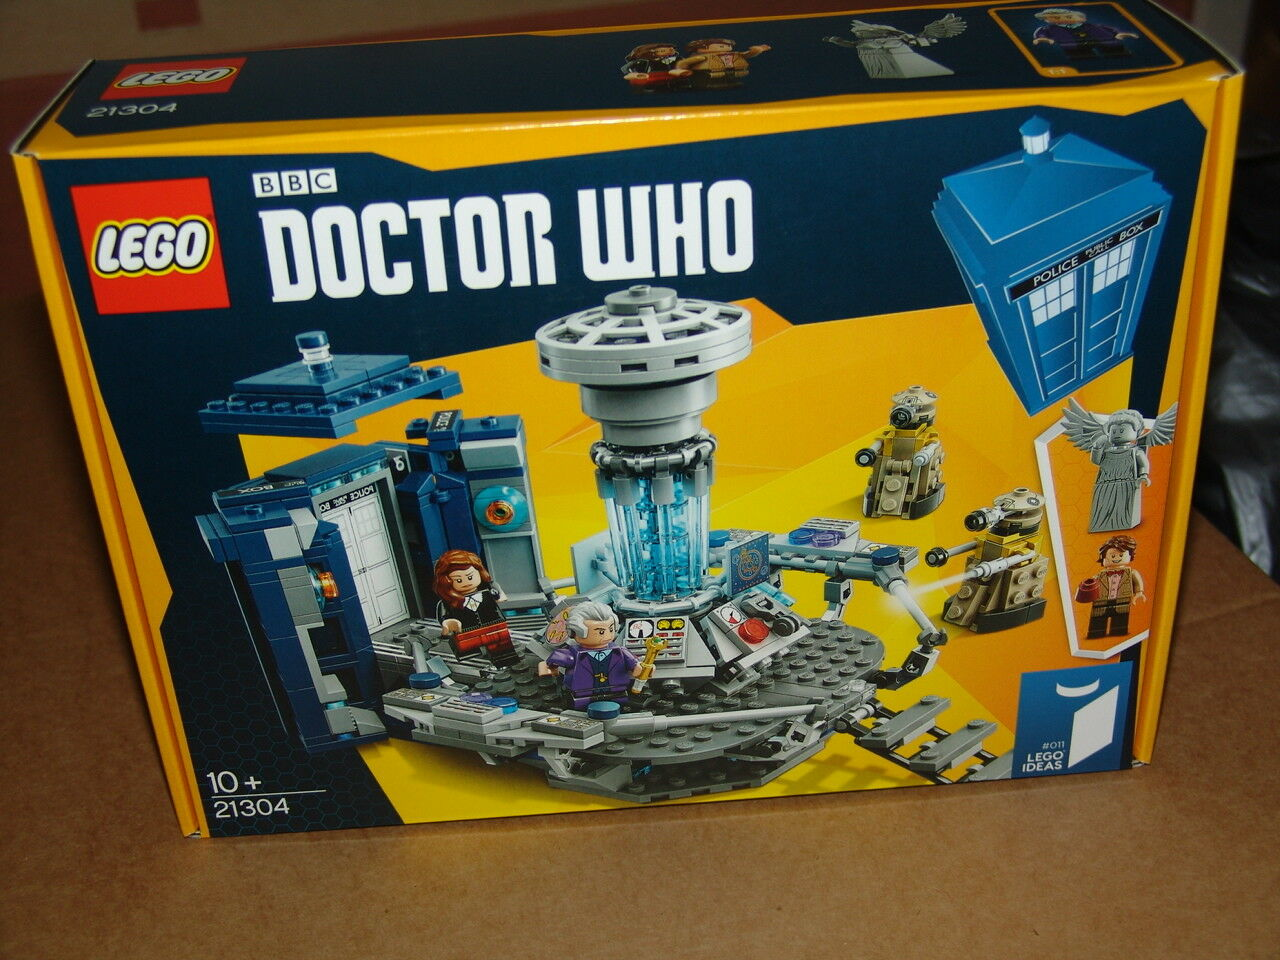 LEGO 21304 Ideas Doctor Who